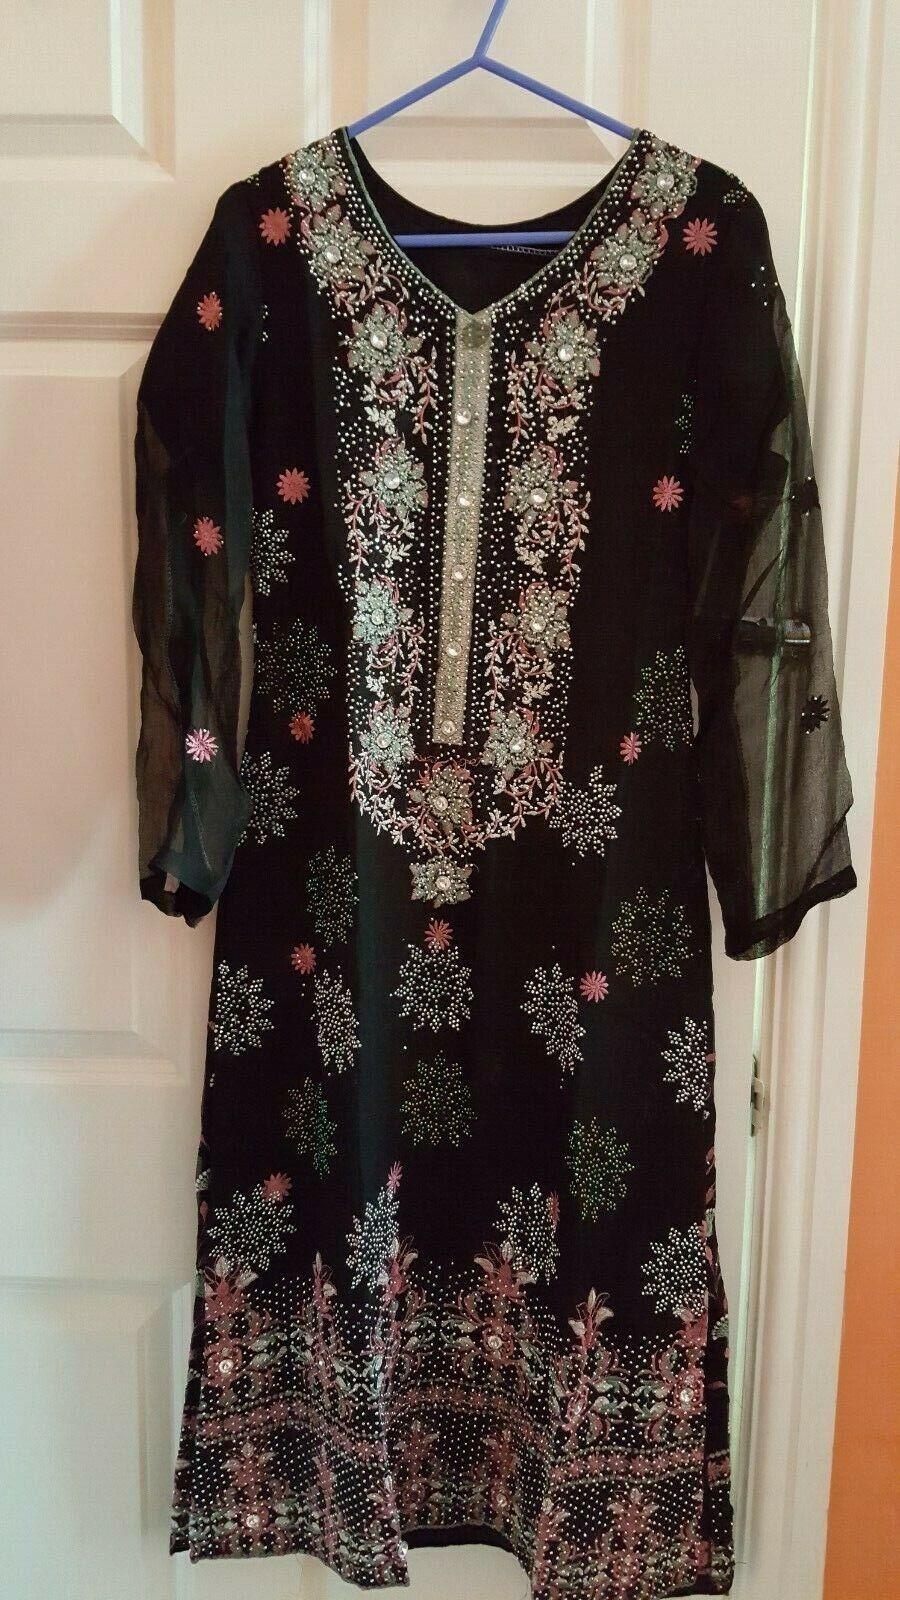 Pakistani Indian Shalwar kameez Asian suit Party Dress Black Size Small